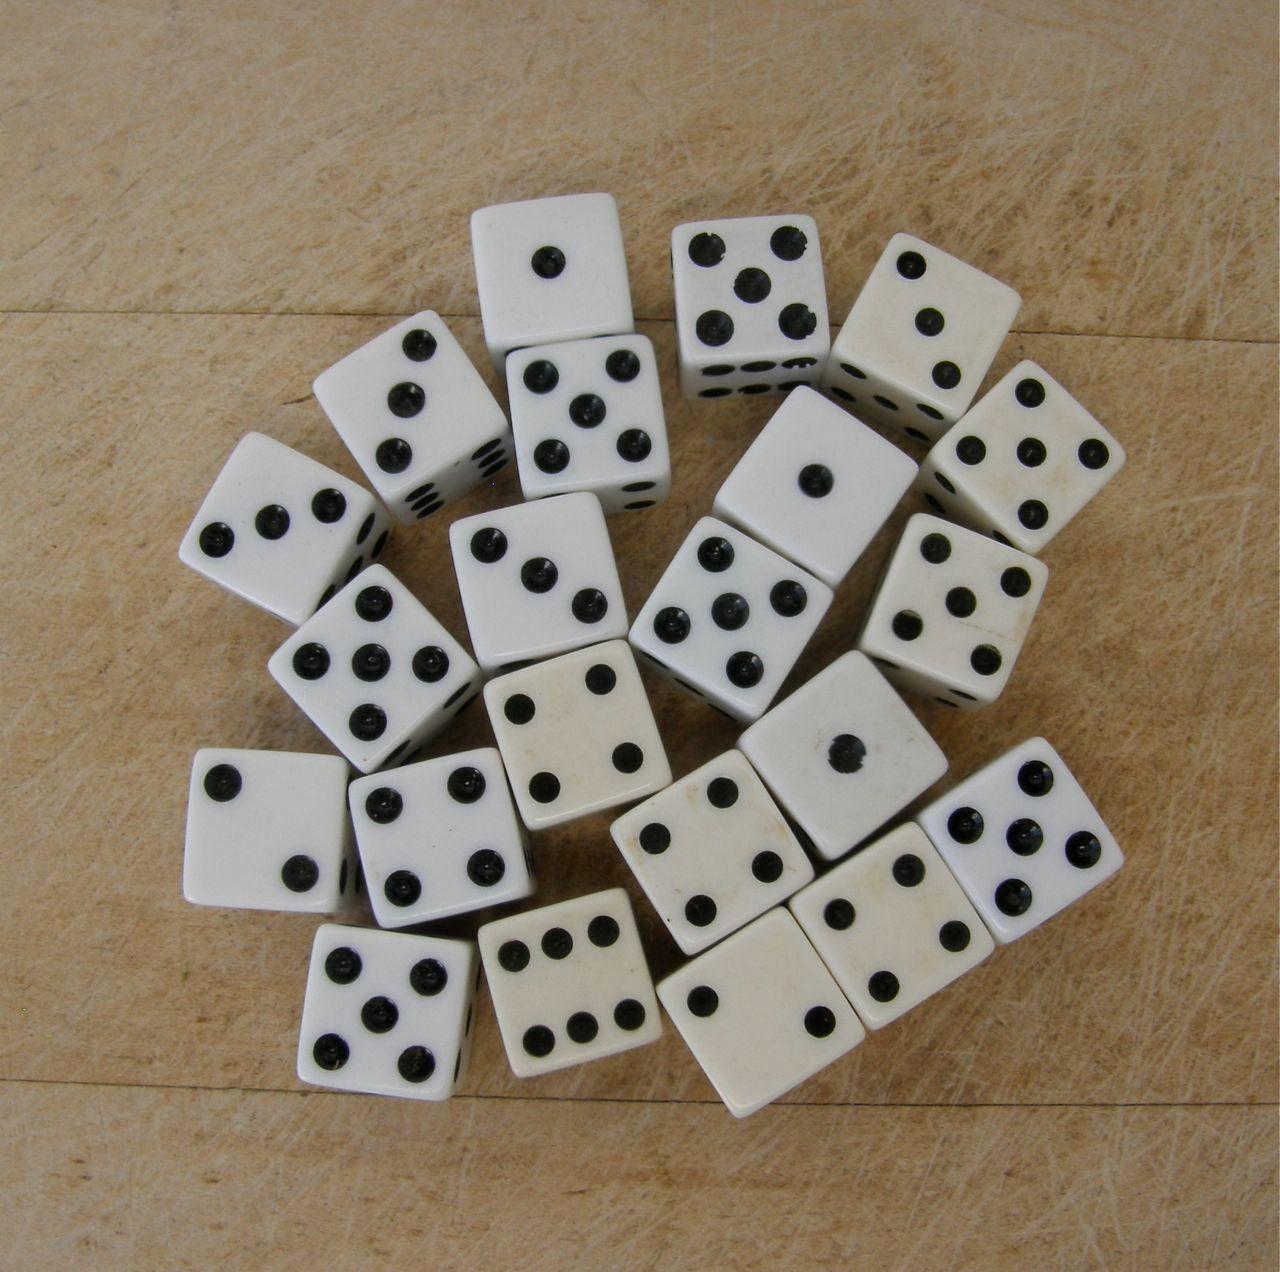 47+ Dice gambling games street mode